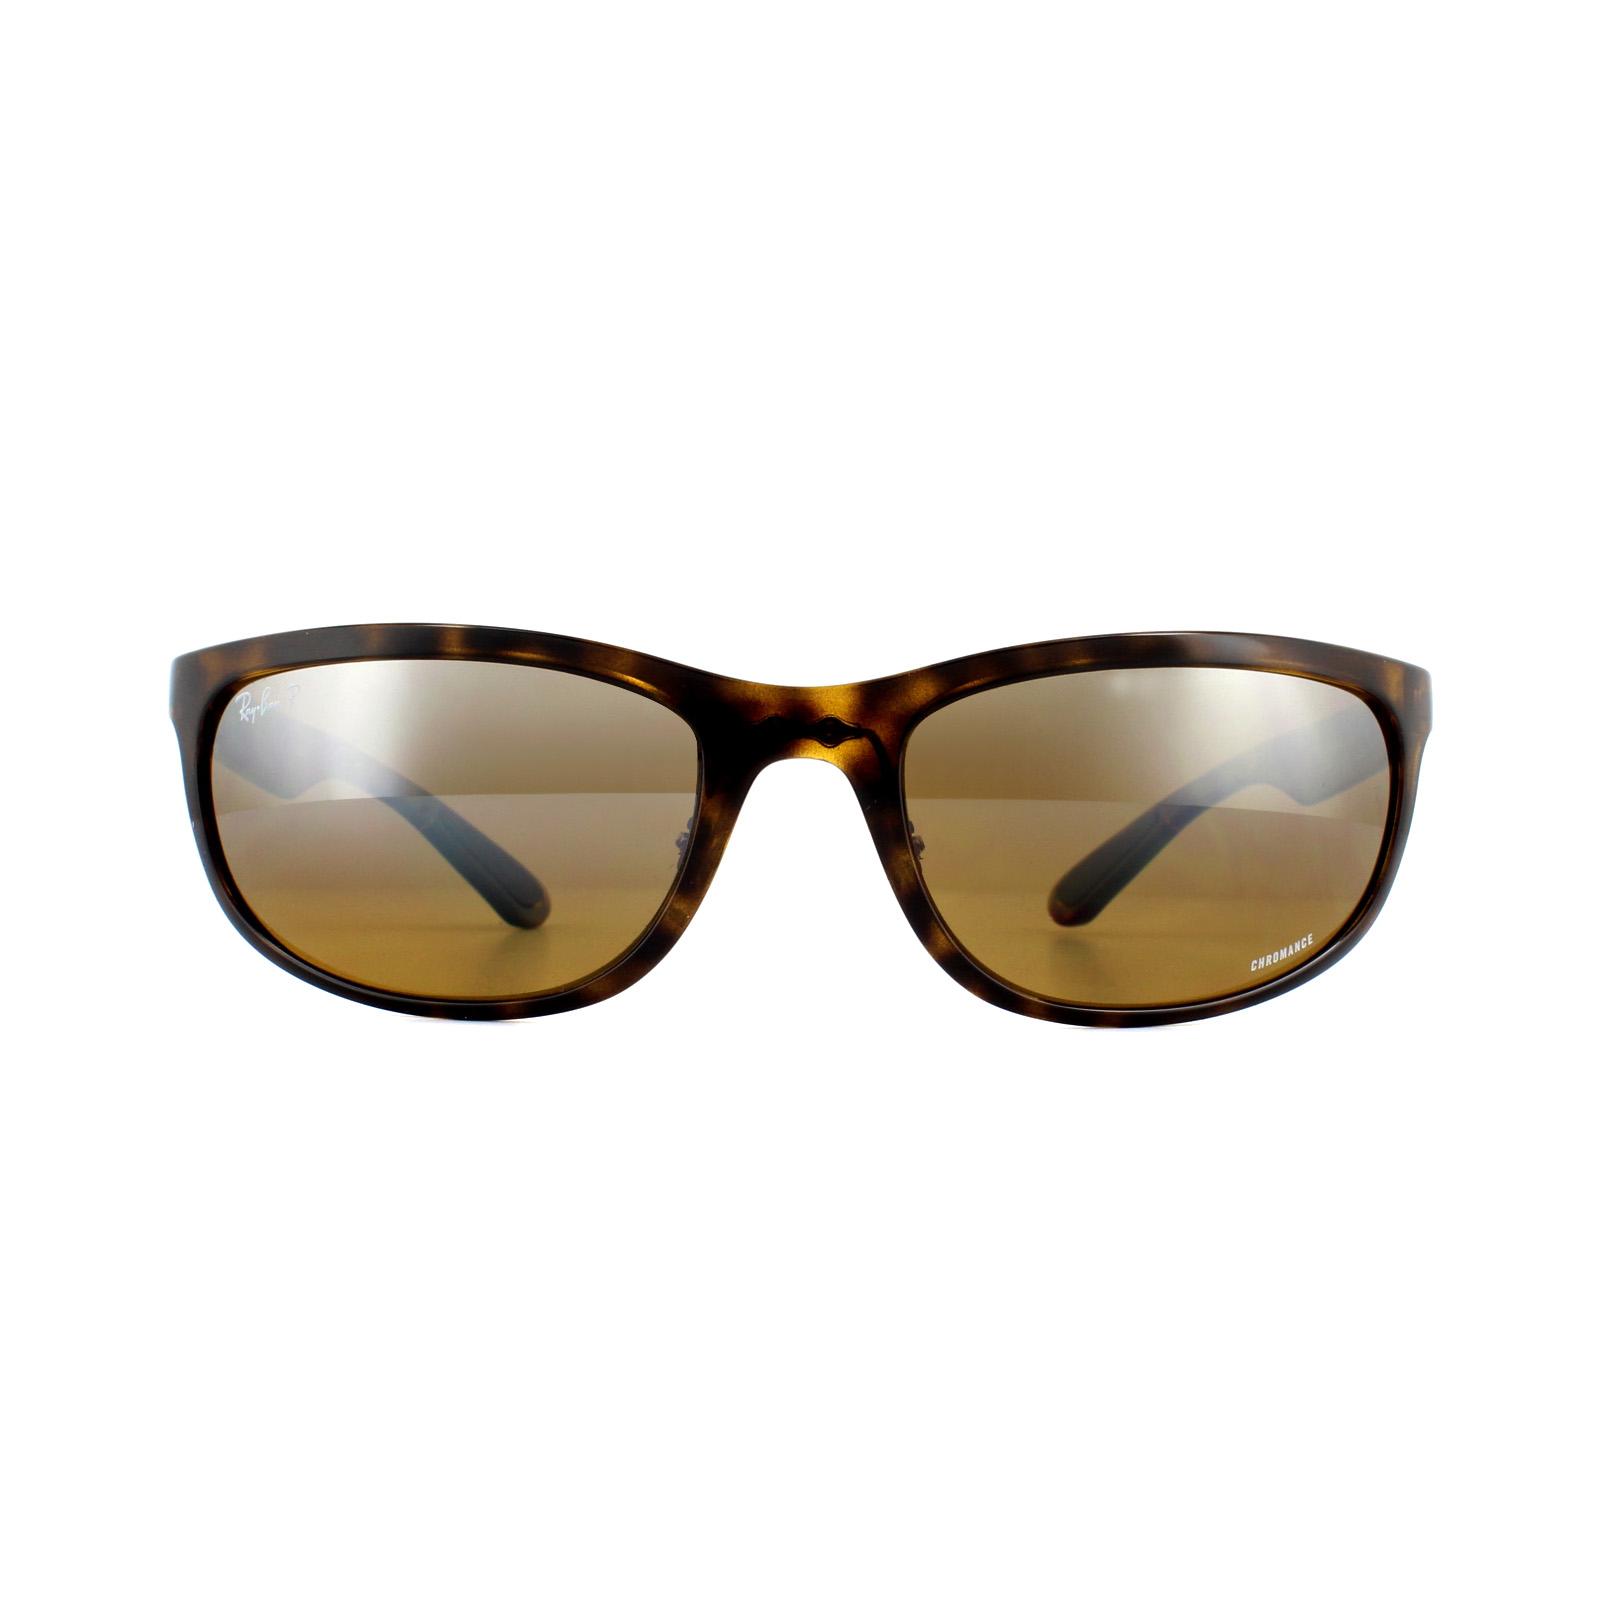 eaf0e3af90 ... Ray-Ban RB4265 Chromance Sunglasses Thumbnail 3 ...